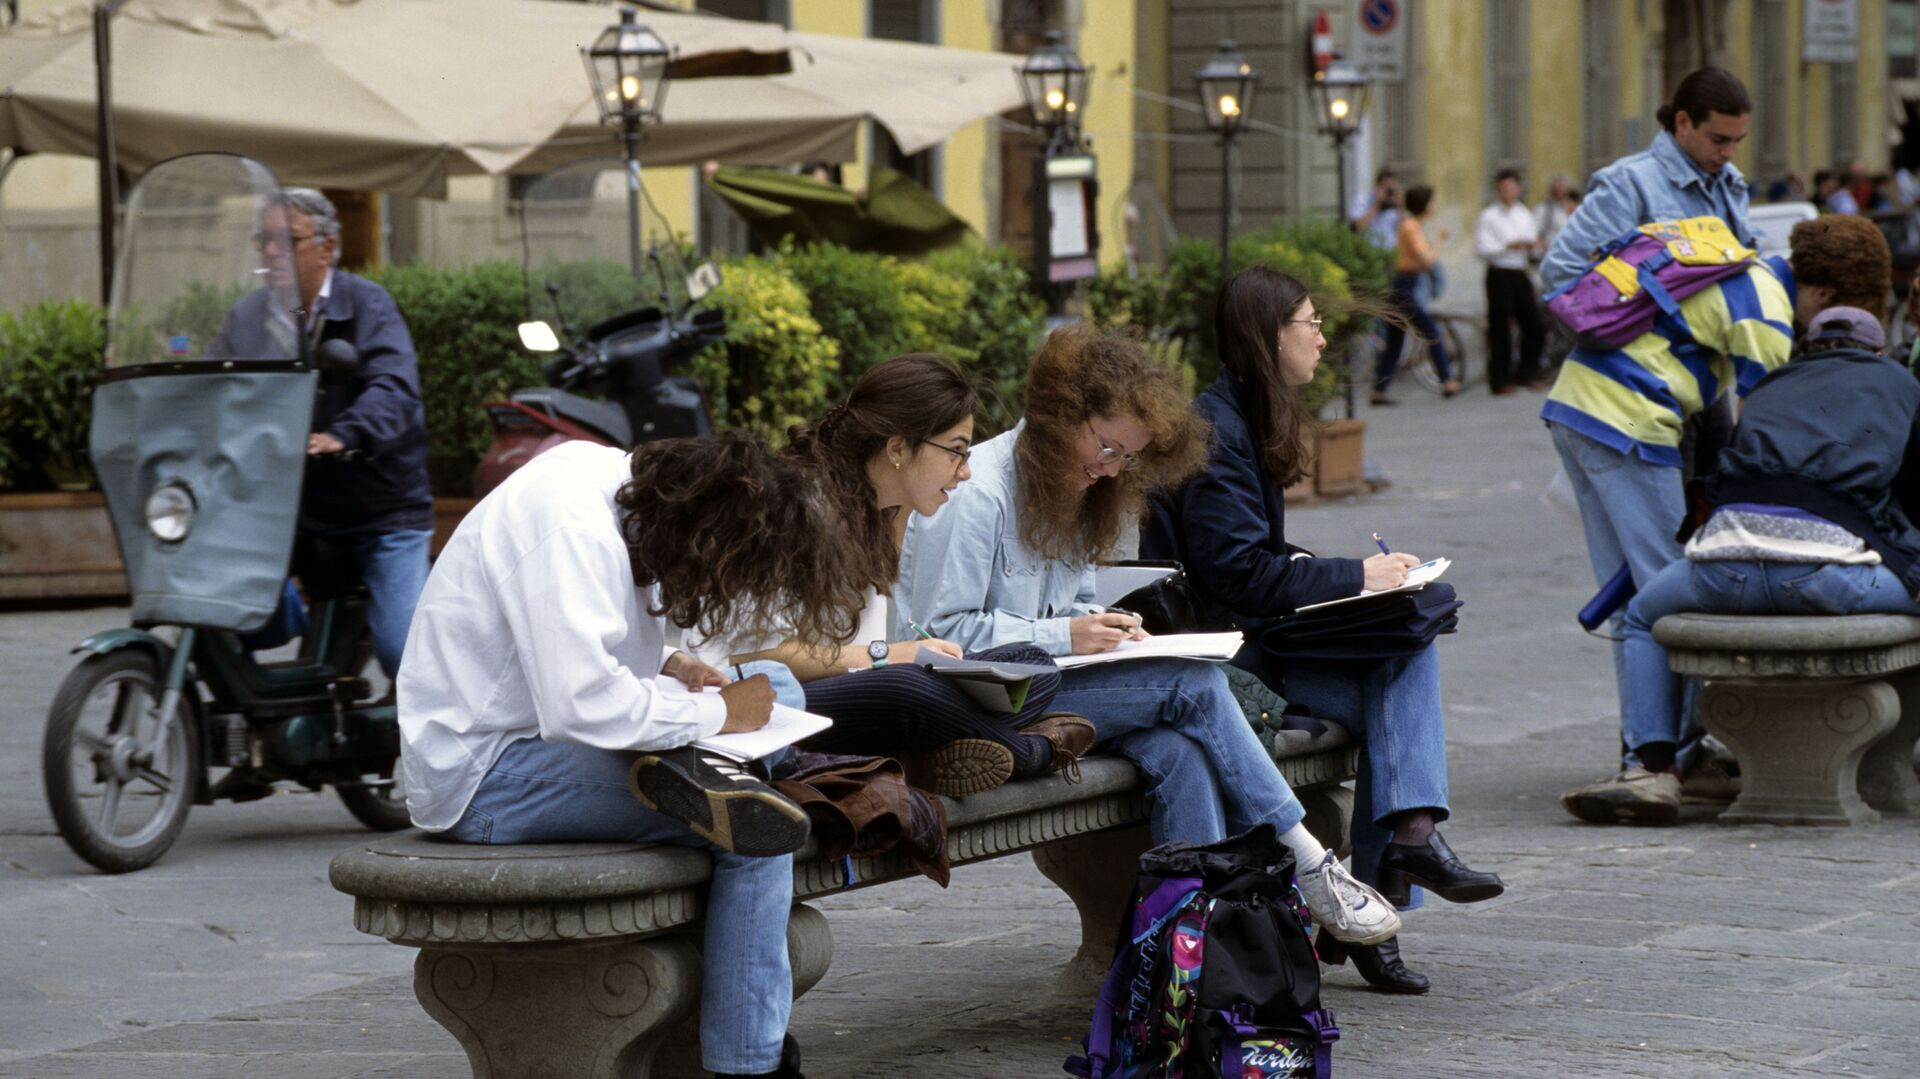 Studenti italiani - Sputnik Italia, 1920, 01.04.2021